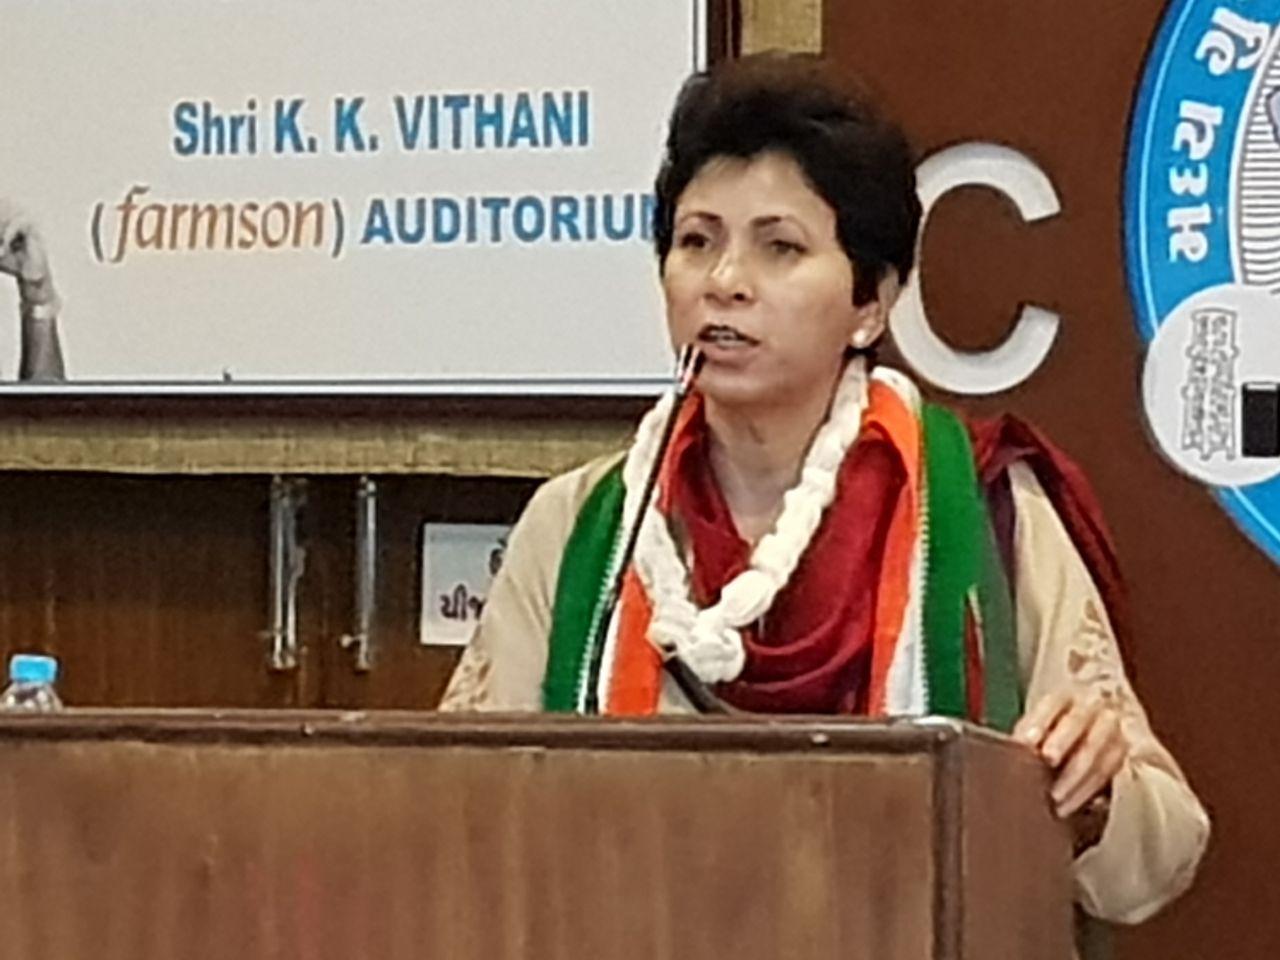 AICC women wing attack BJP on Gujarat model